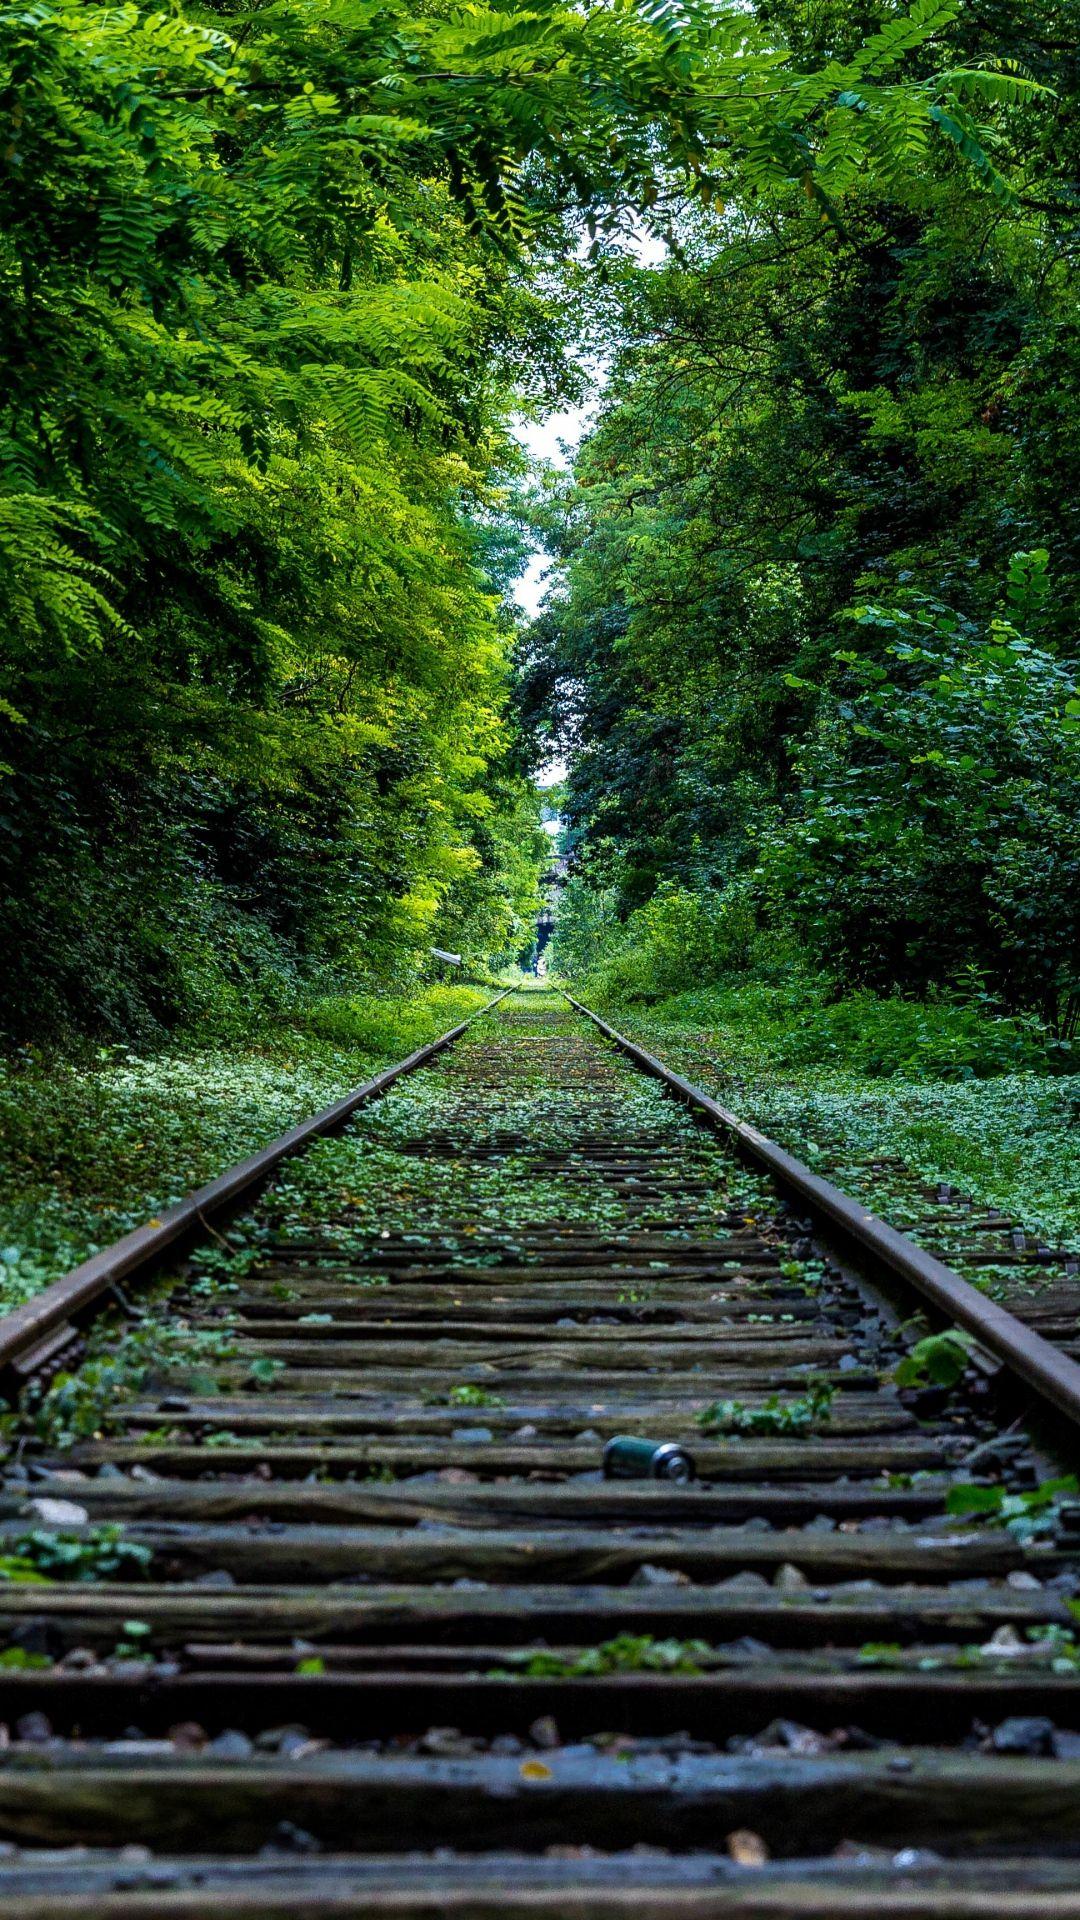 Wooden Retro Railroad Grass Trees IPhone 7 Wallpaper